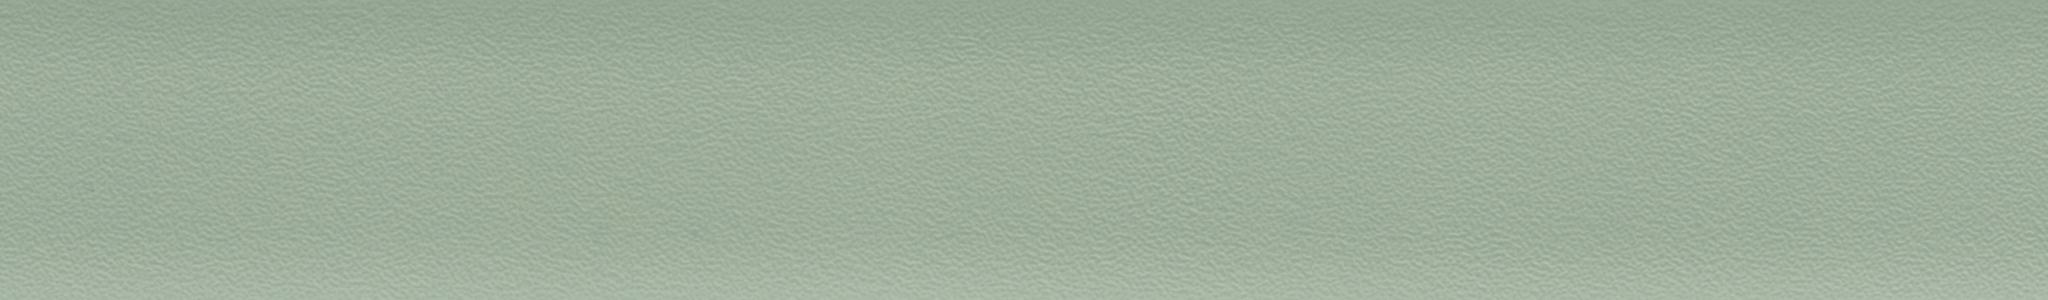 HU 16631 ABS hrana zelená perla 101